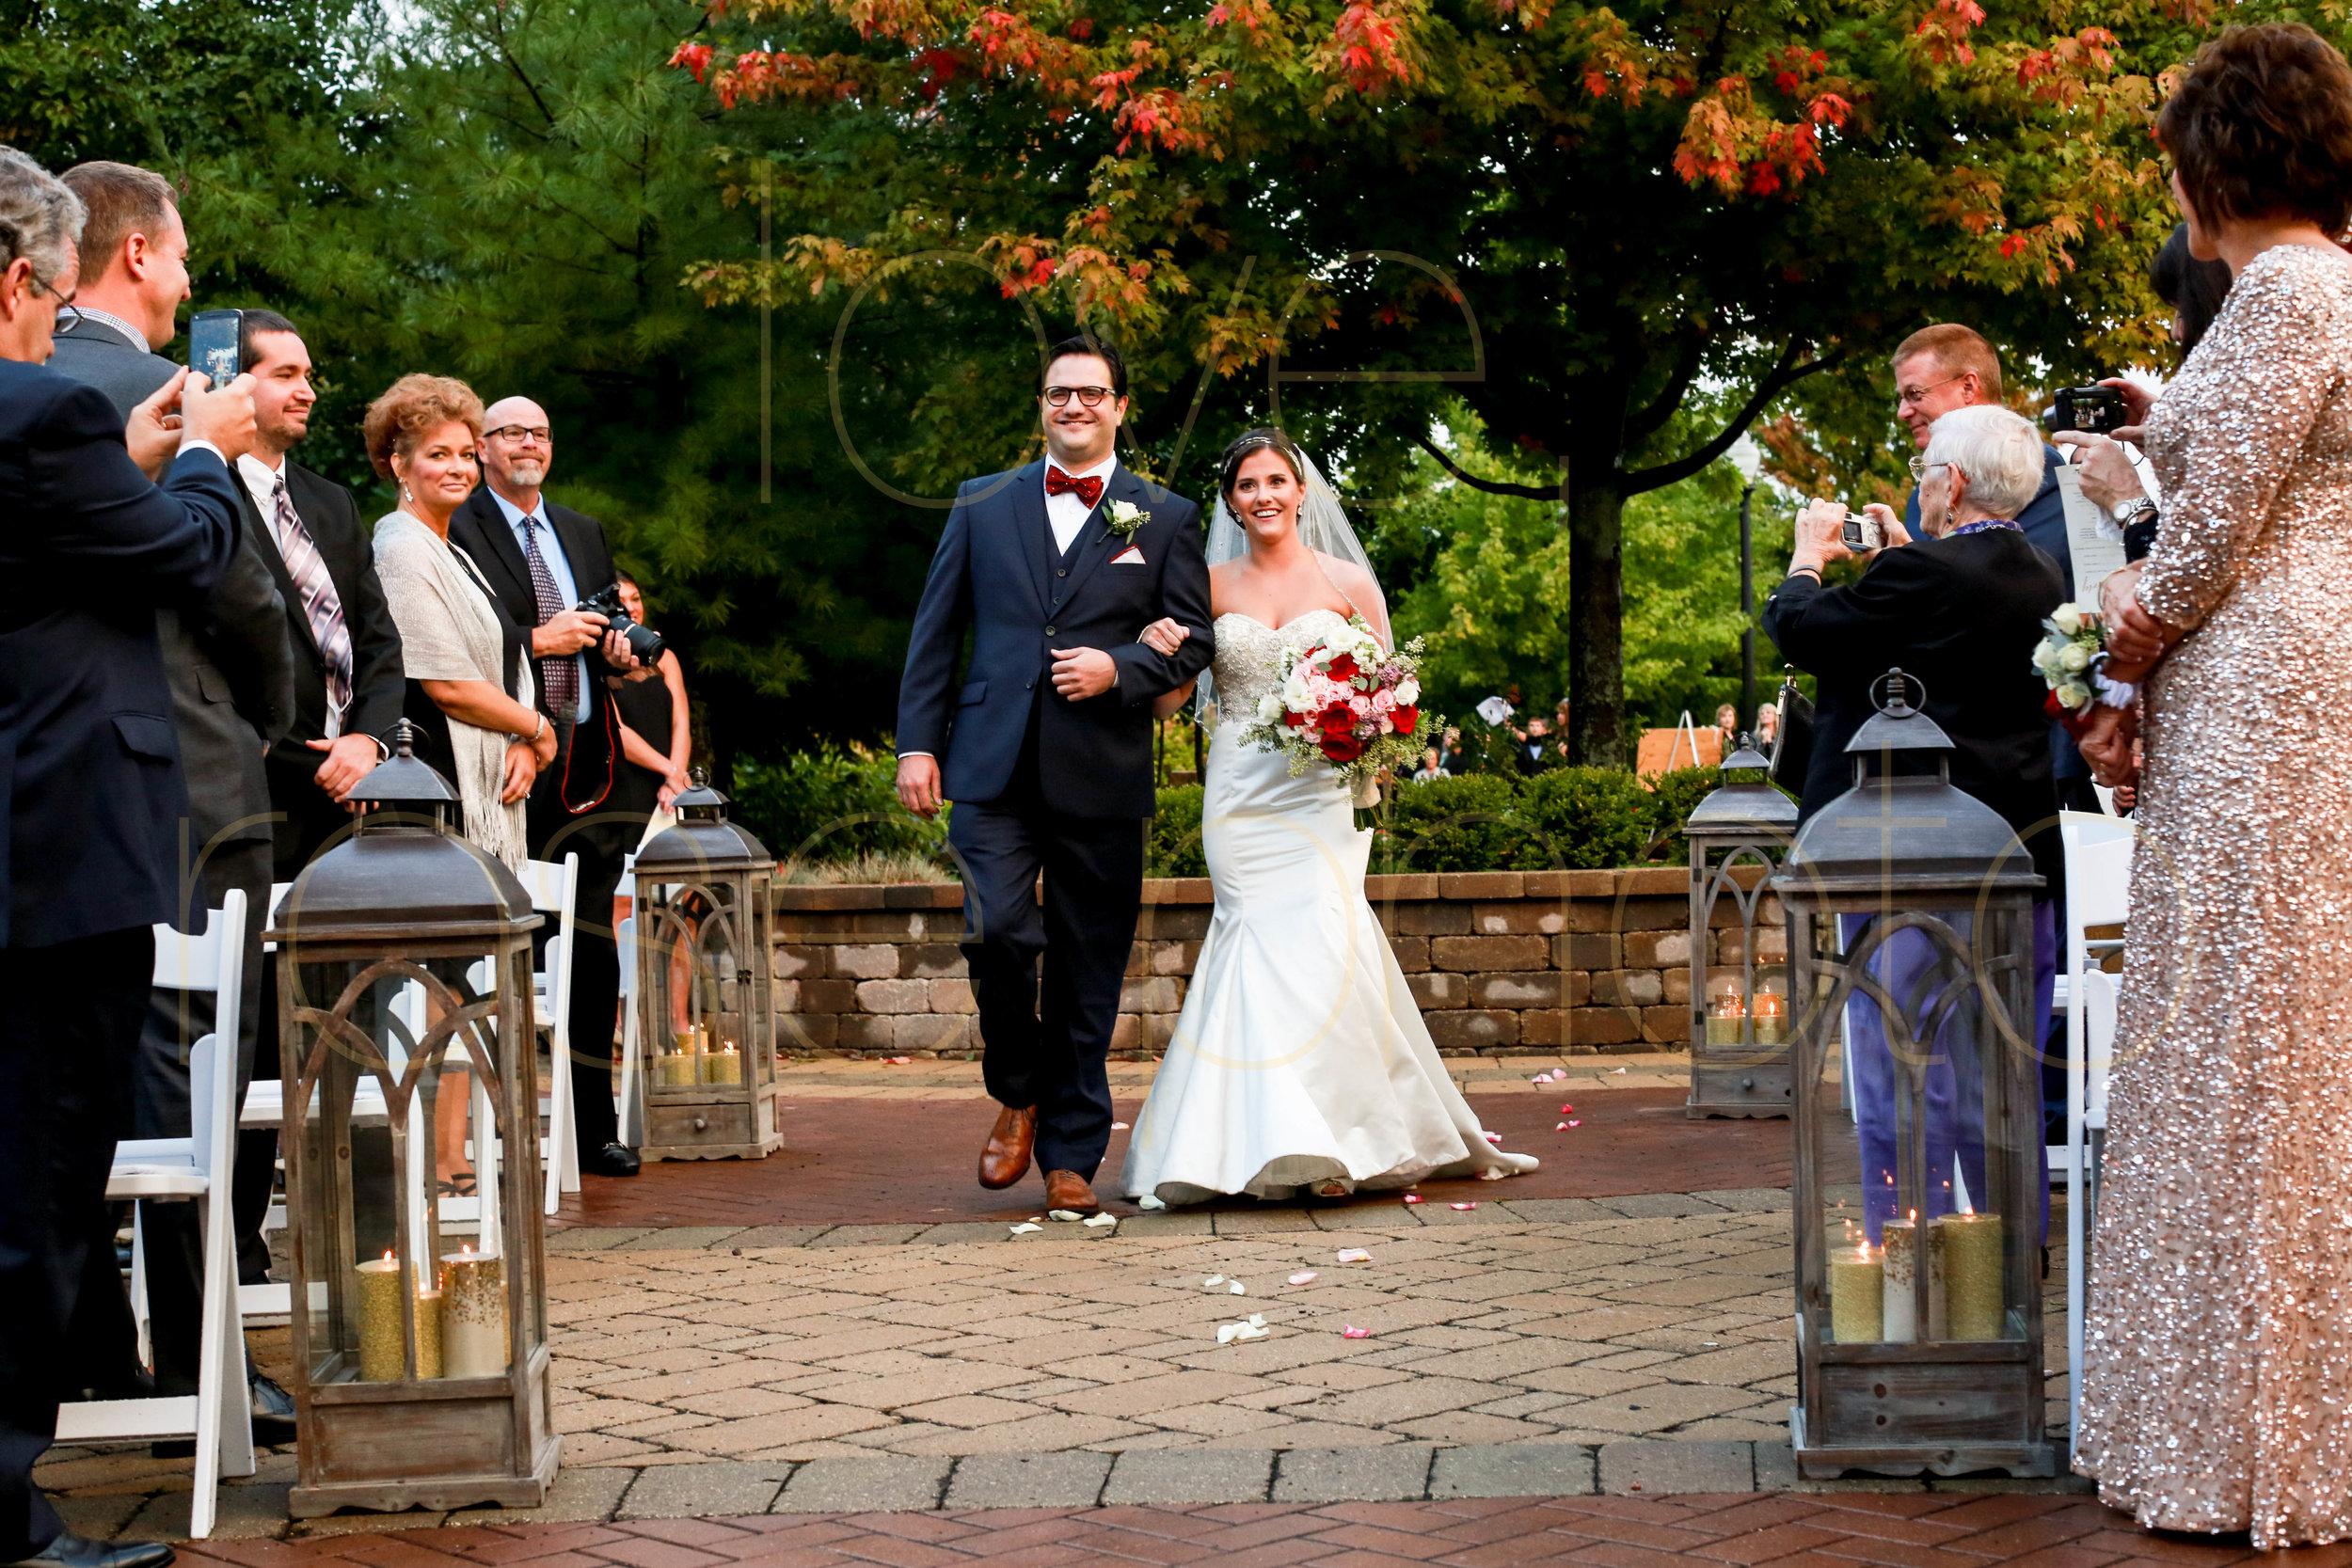 Alison + Mike Chicago Wedding Photographer Blog -20.jpg